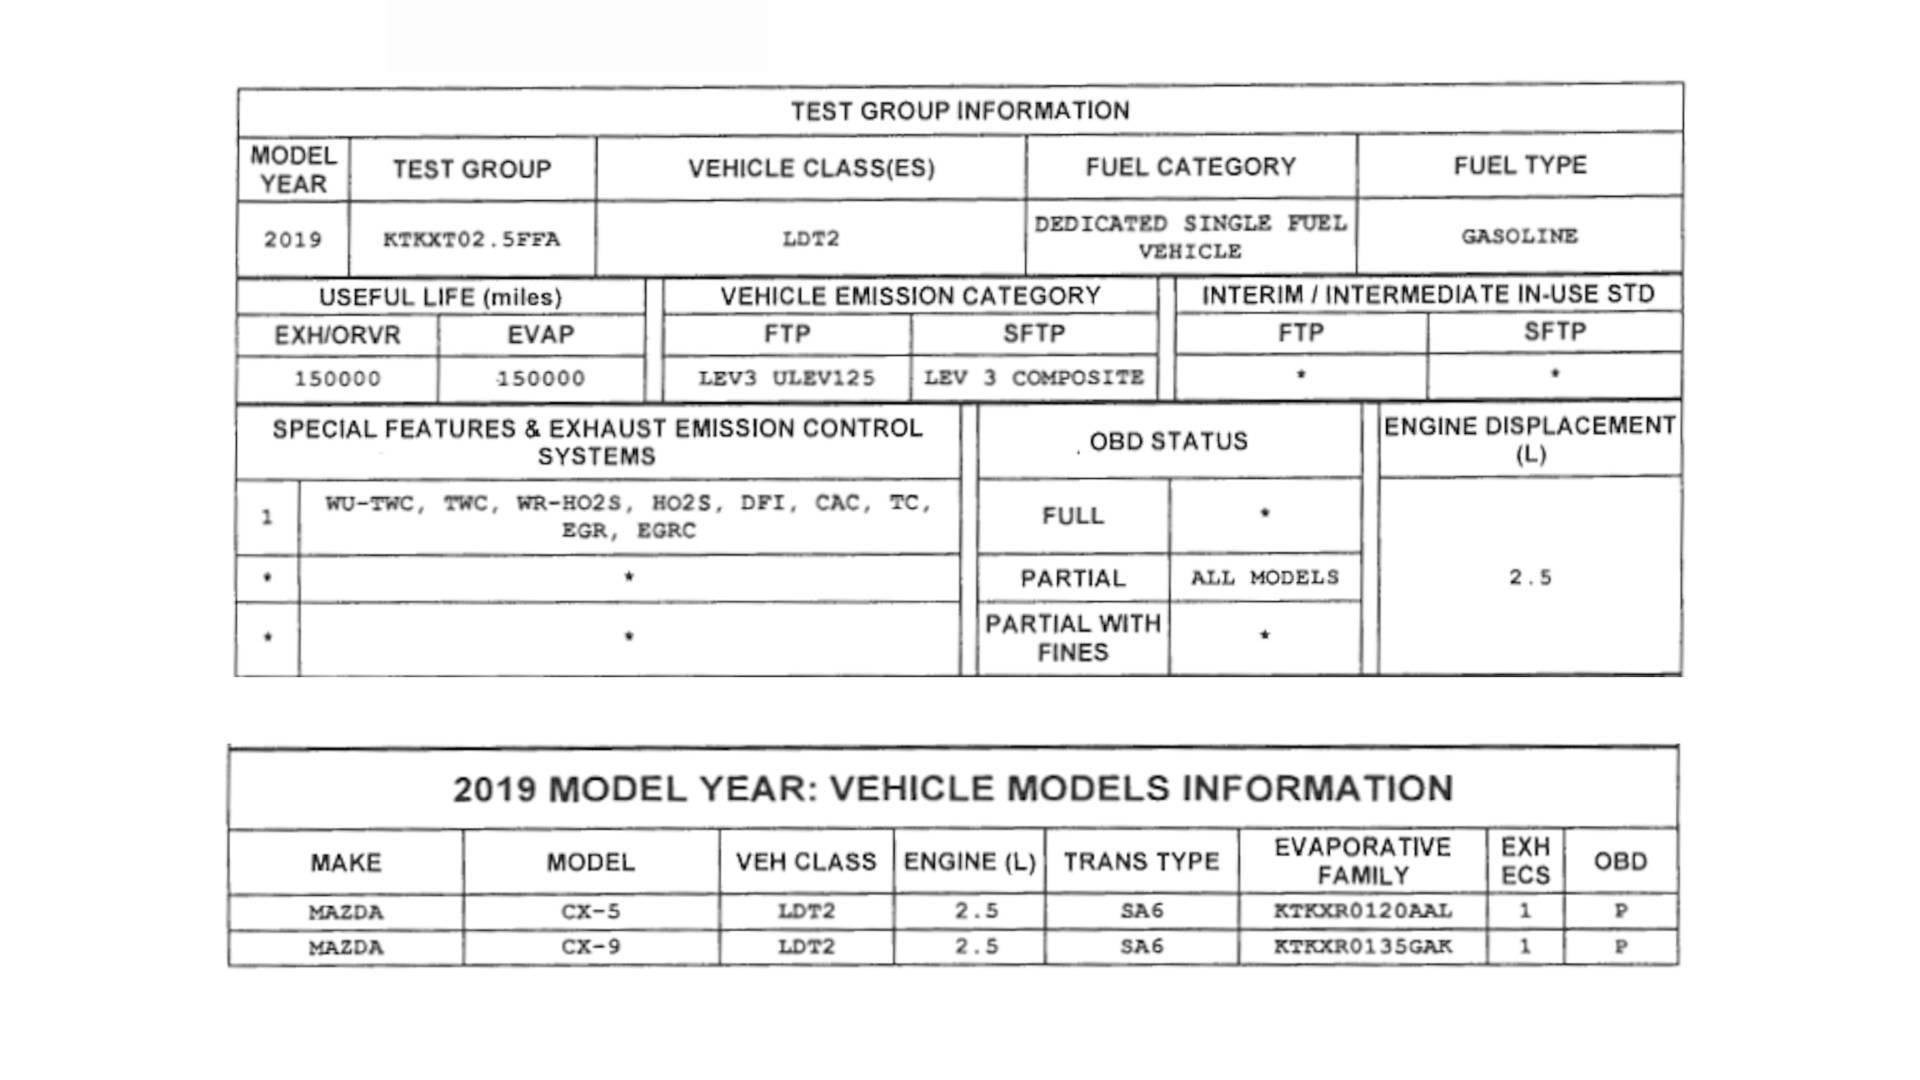 2019-mazda-cx-5-gains-25-liter-turbo-skyactiv-g-engine-in-the-united-states-126512_1.jpg